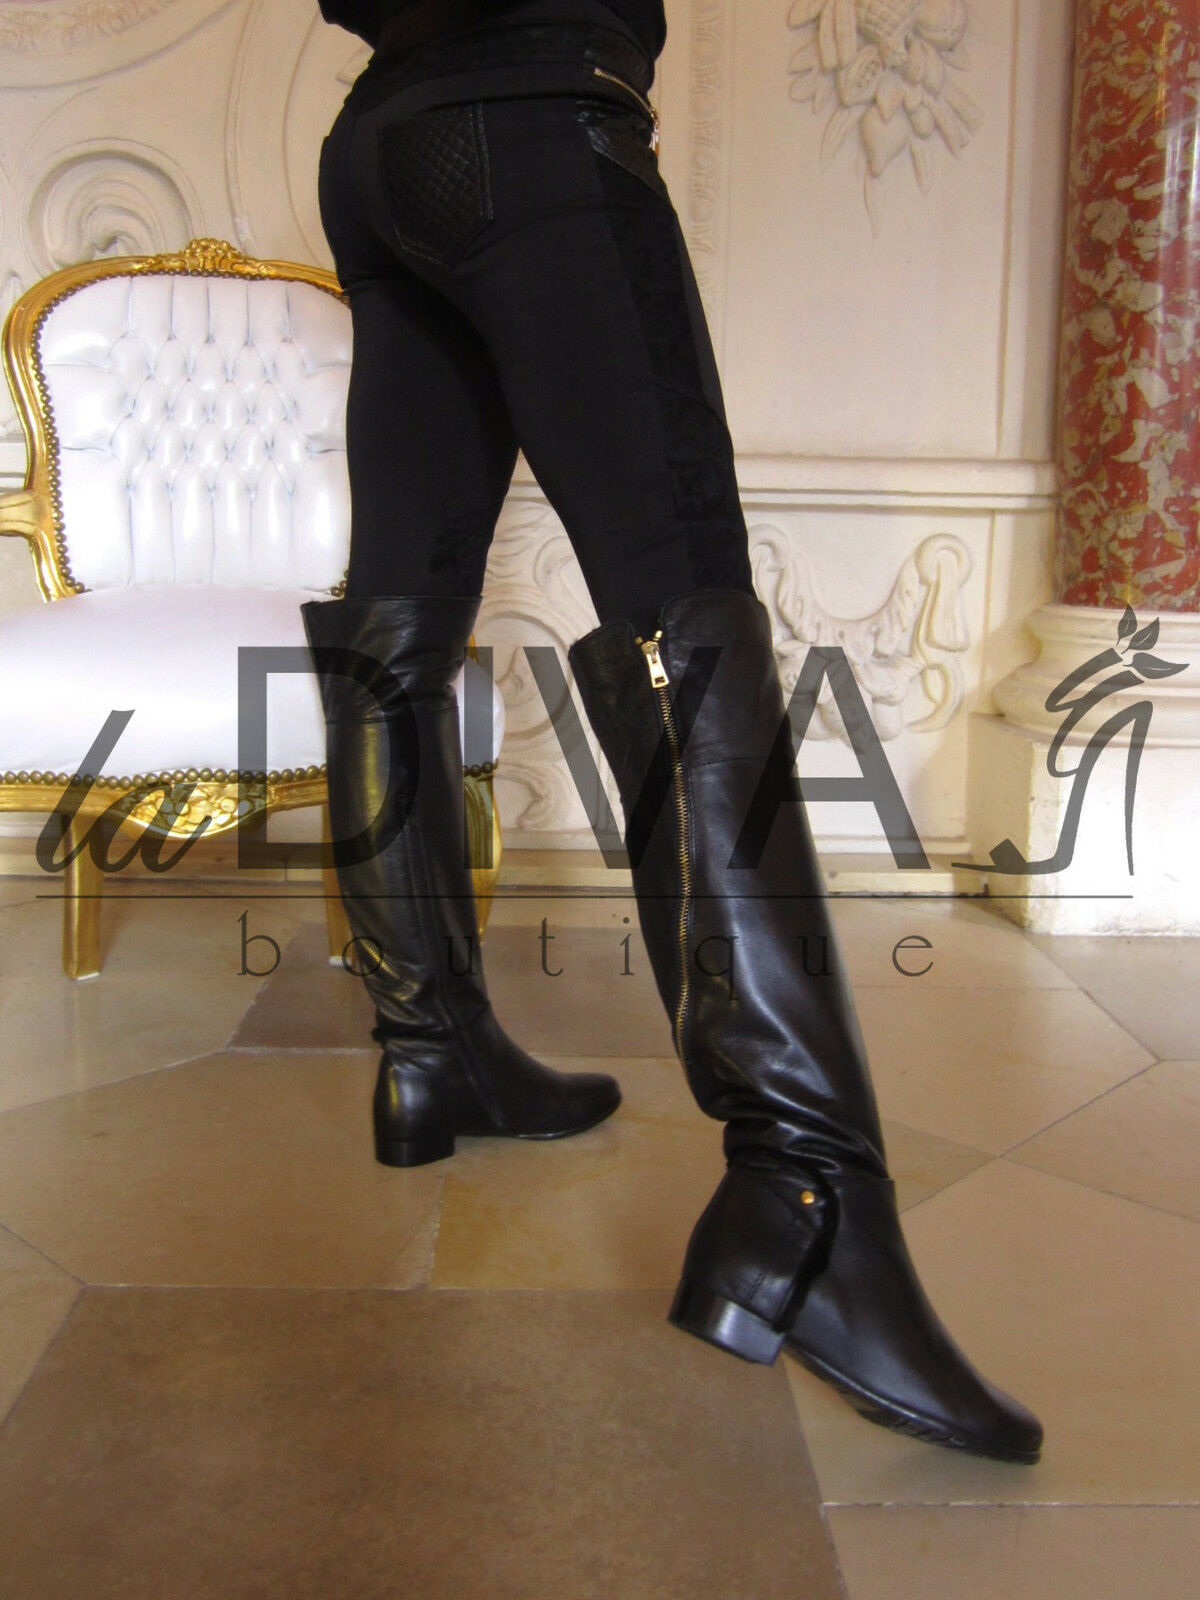 Grandes zapatos con descuento NAPOLEONI ~ Designer ITALY Fell Stiefel Leder 36 Zipper Overknee Boots schwarz